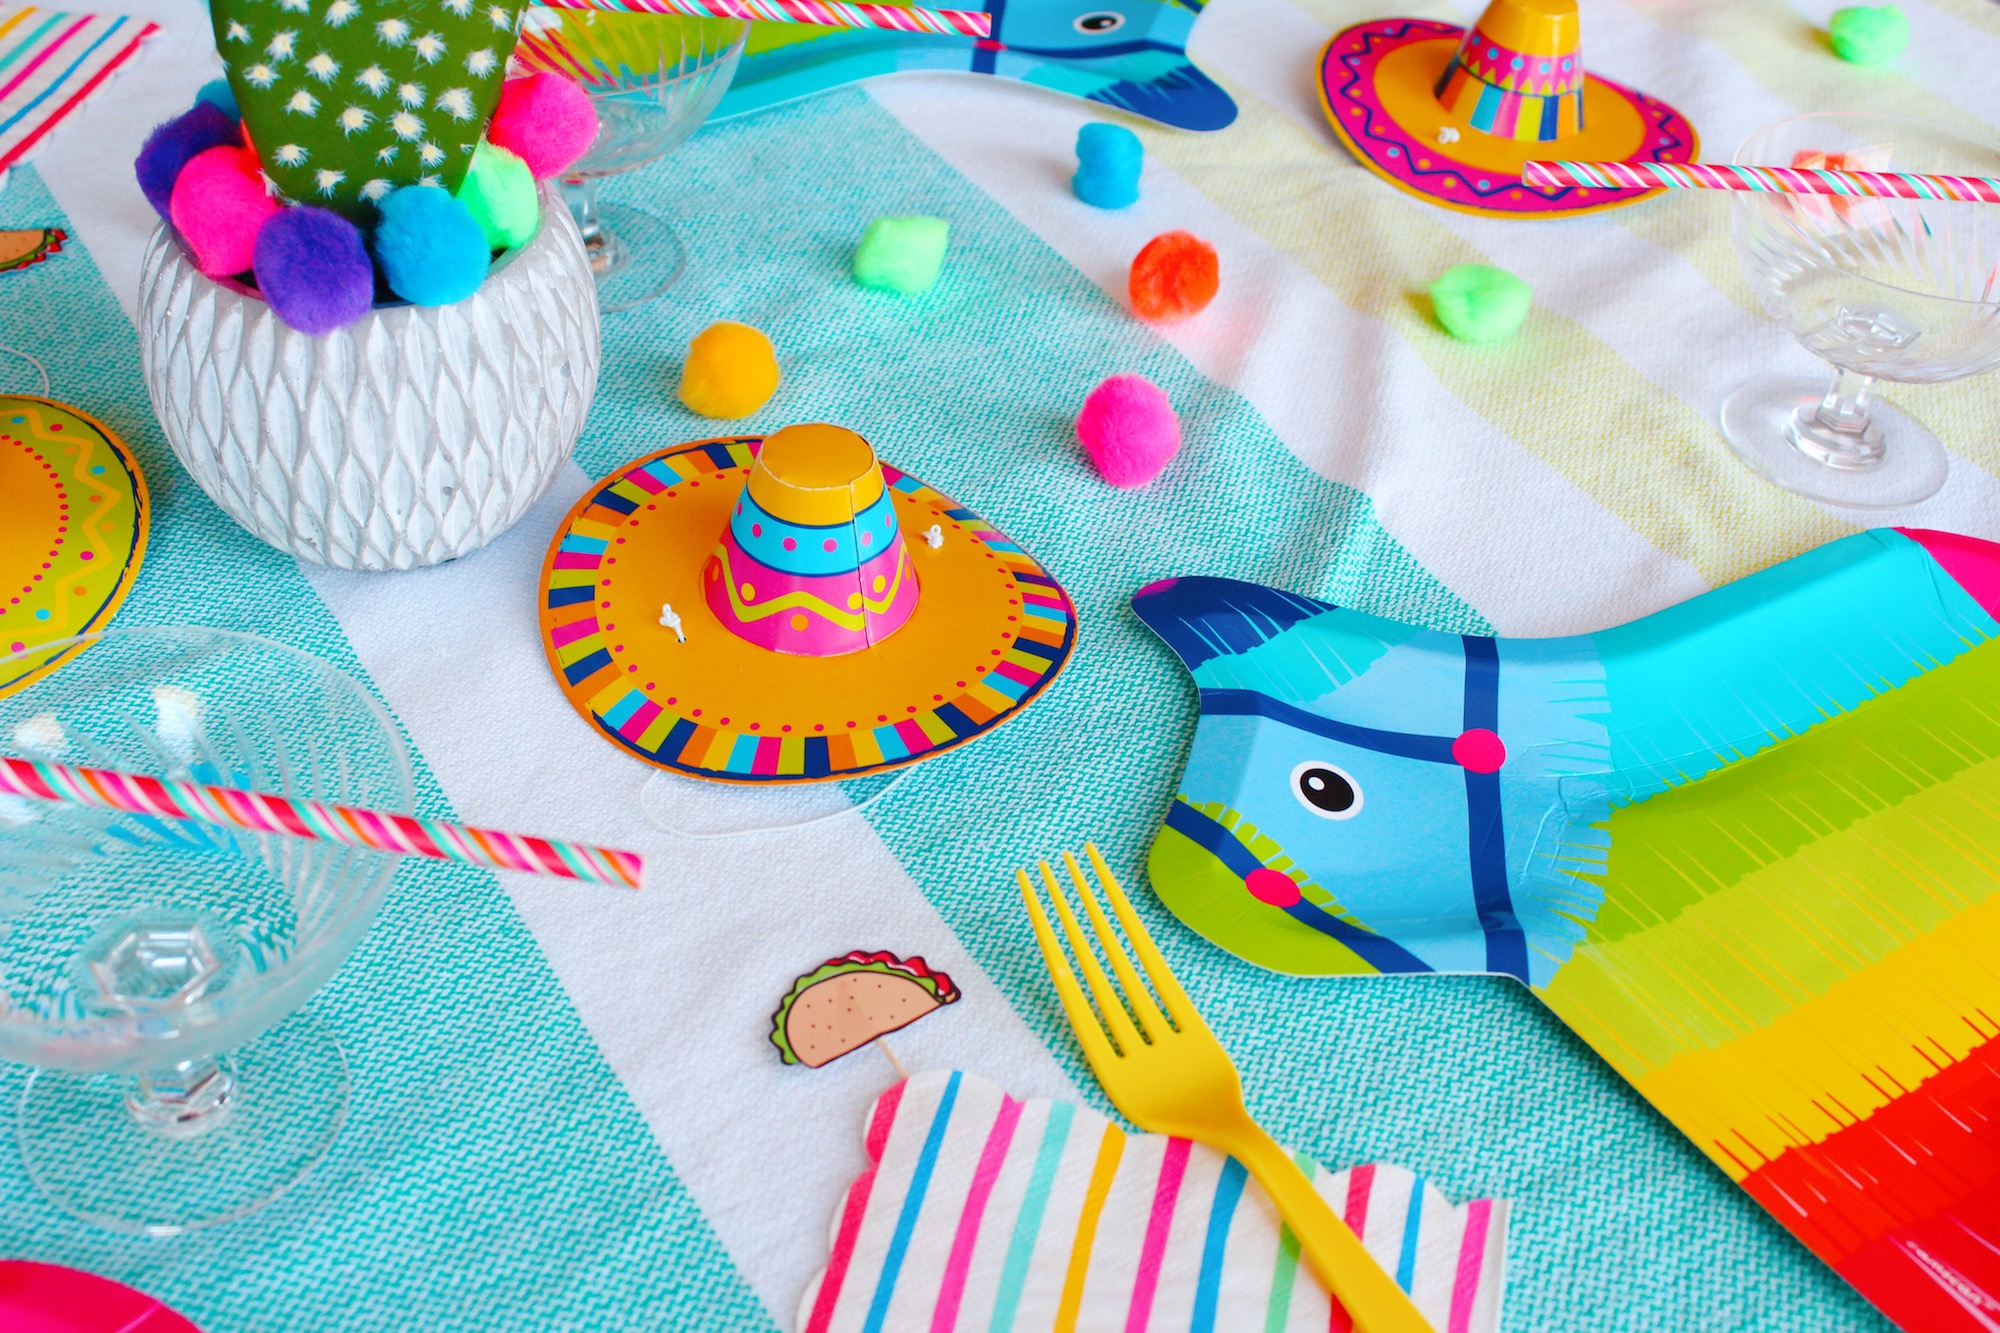 Fiesta Pinata Table Ideas_Design Organize Party.JPG